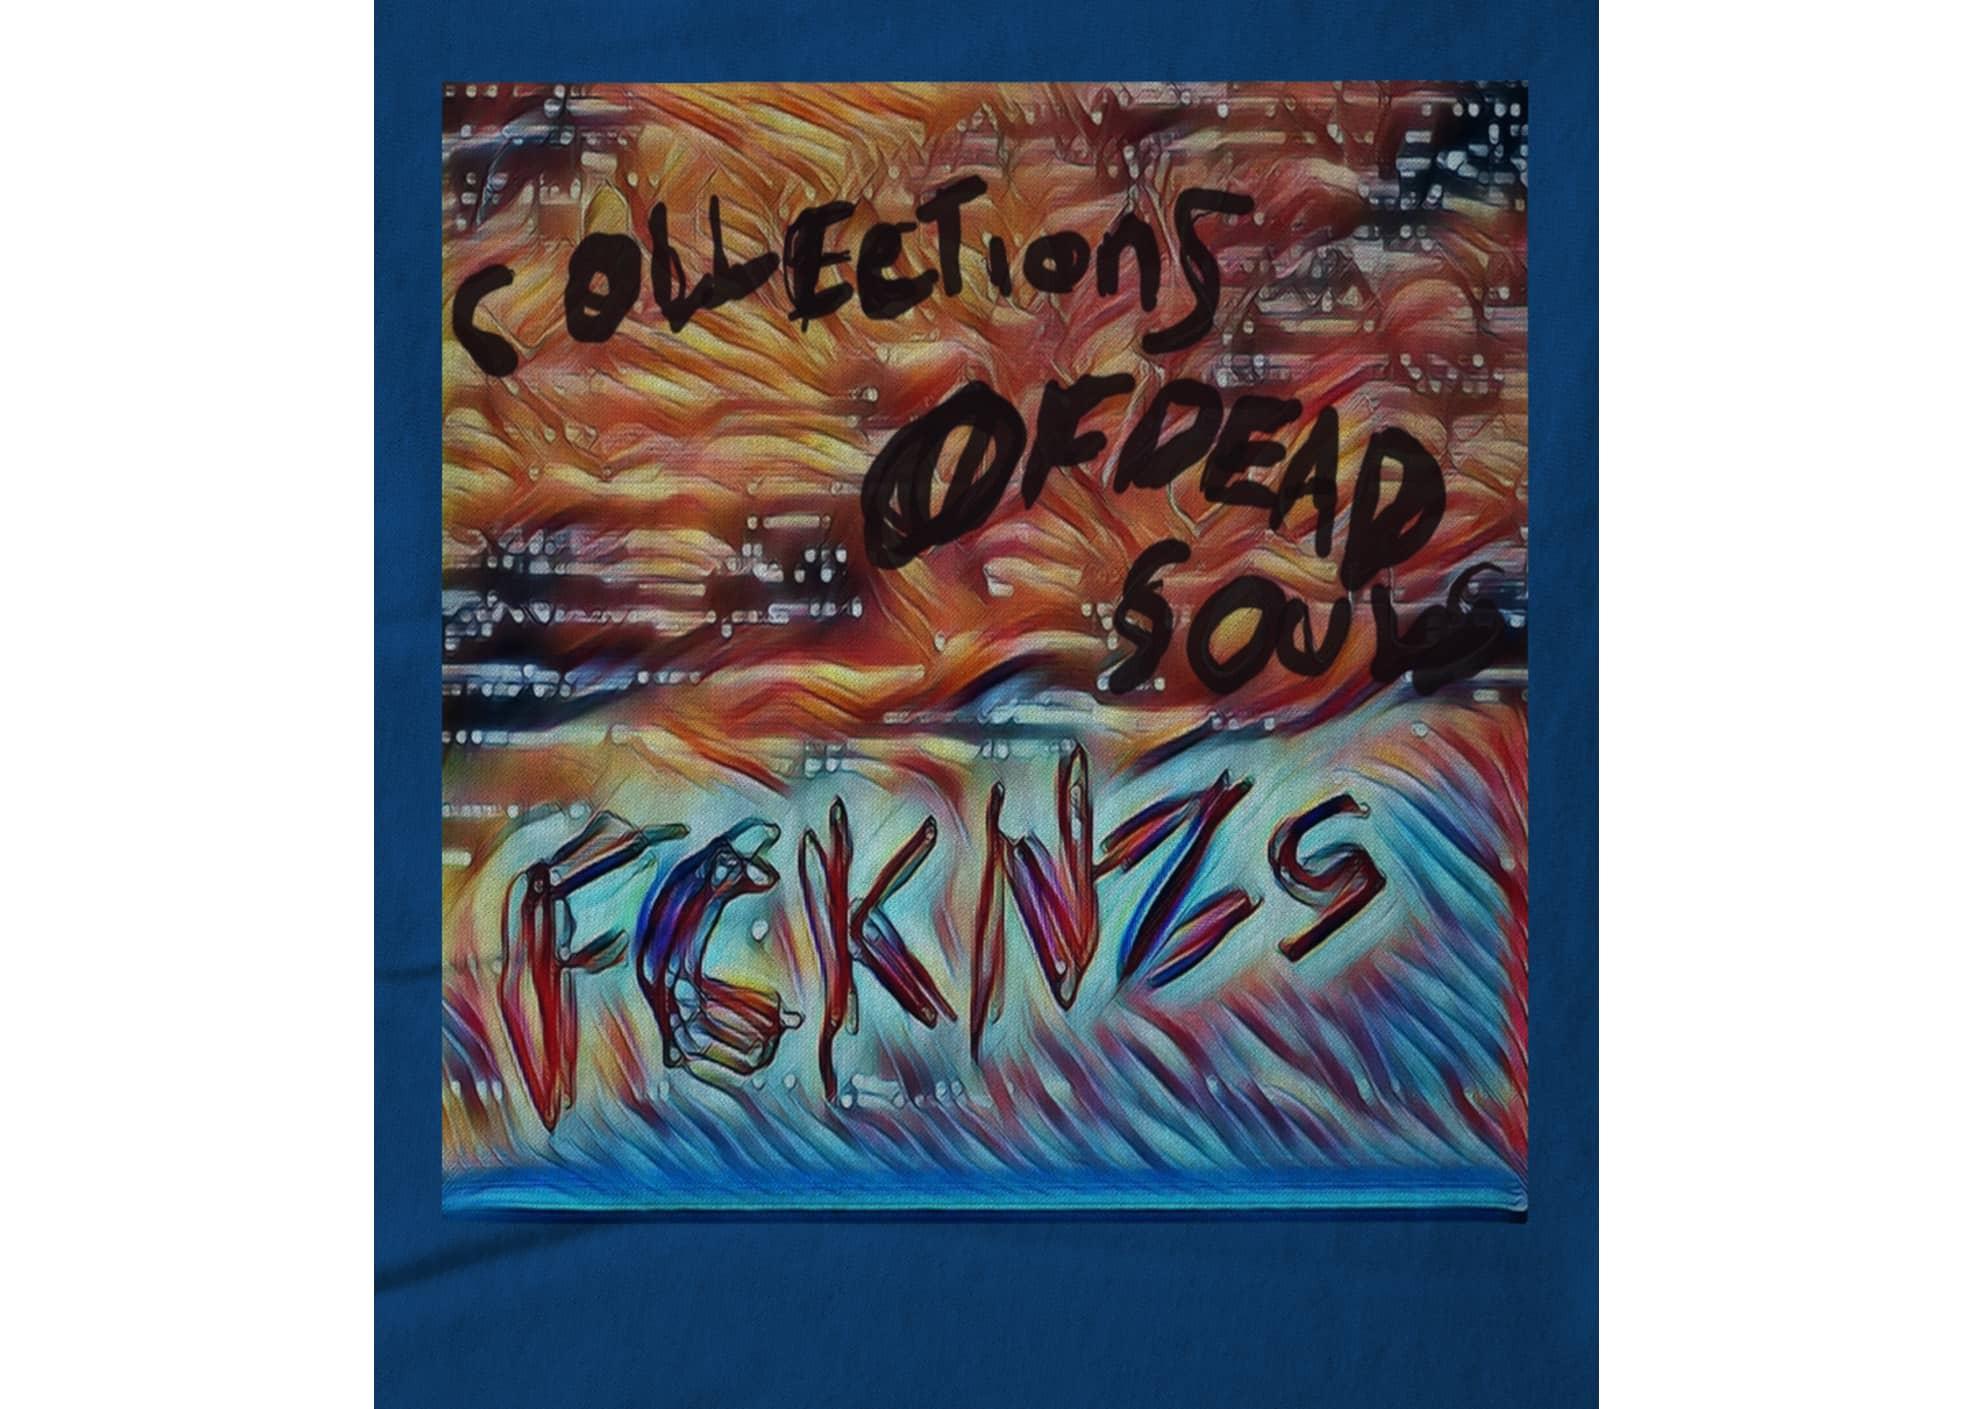 Collections of dead souls fcknzs 1541063714